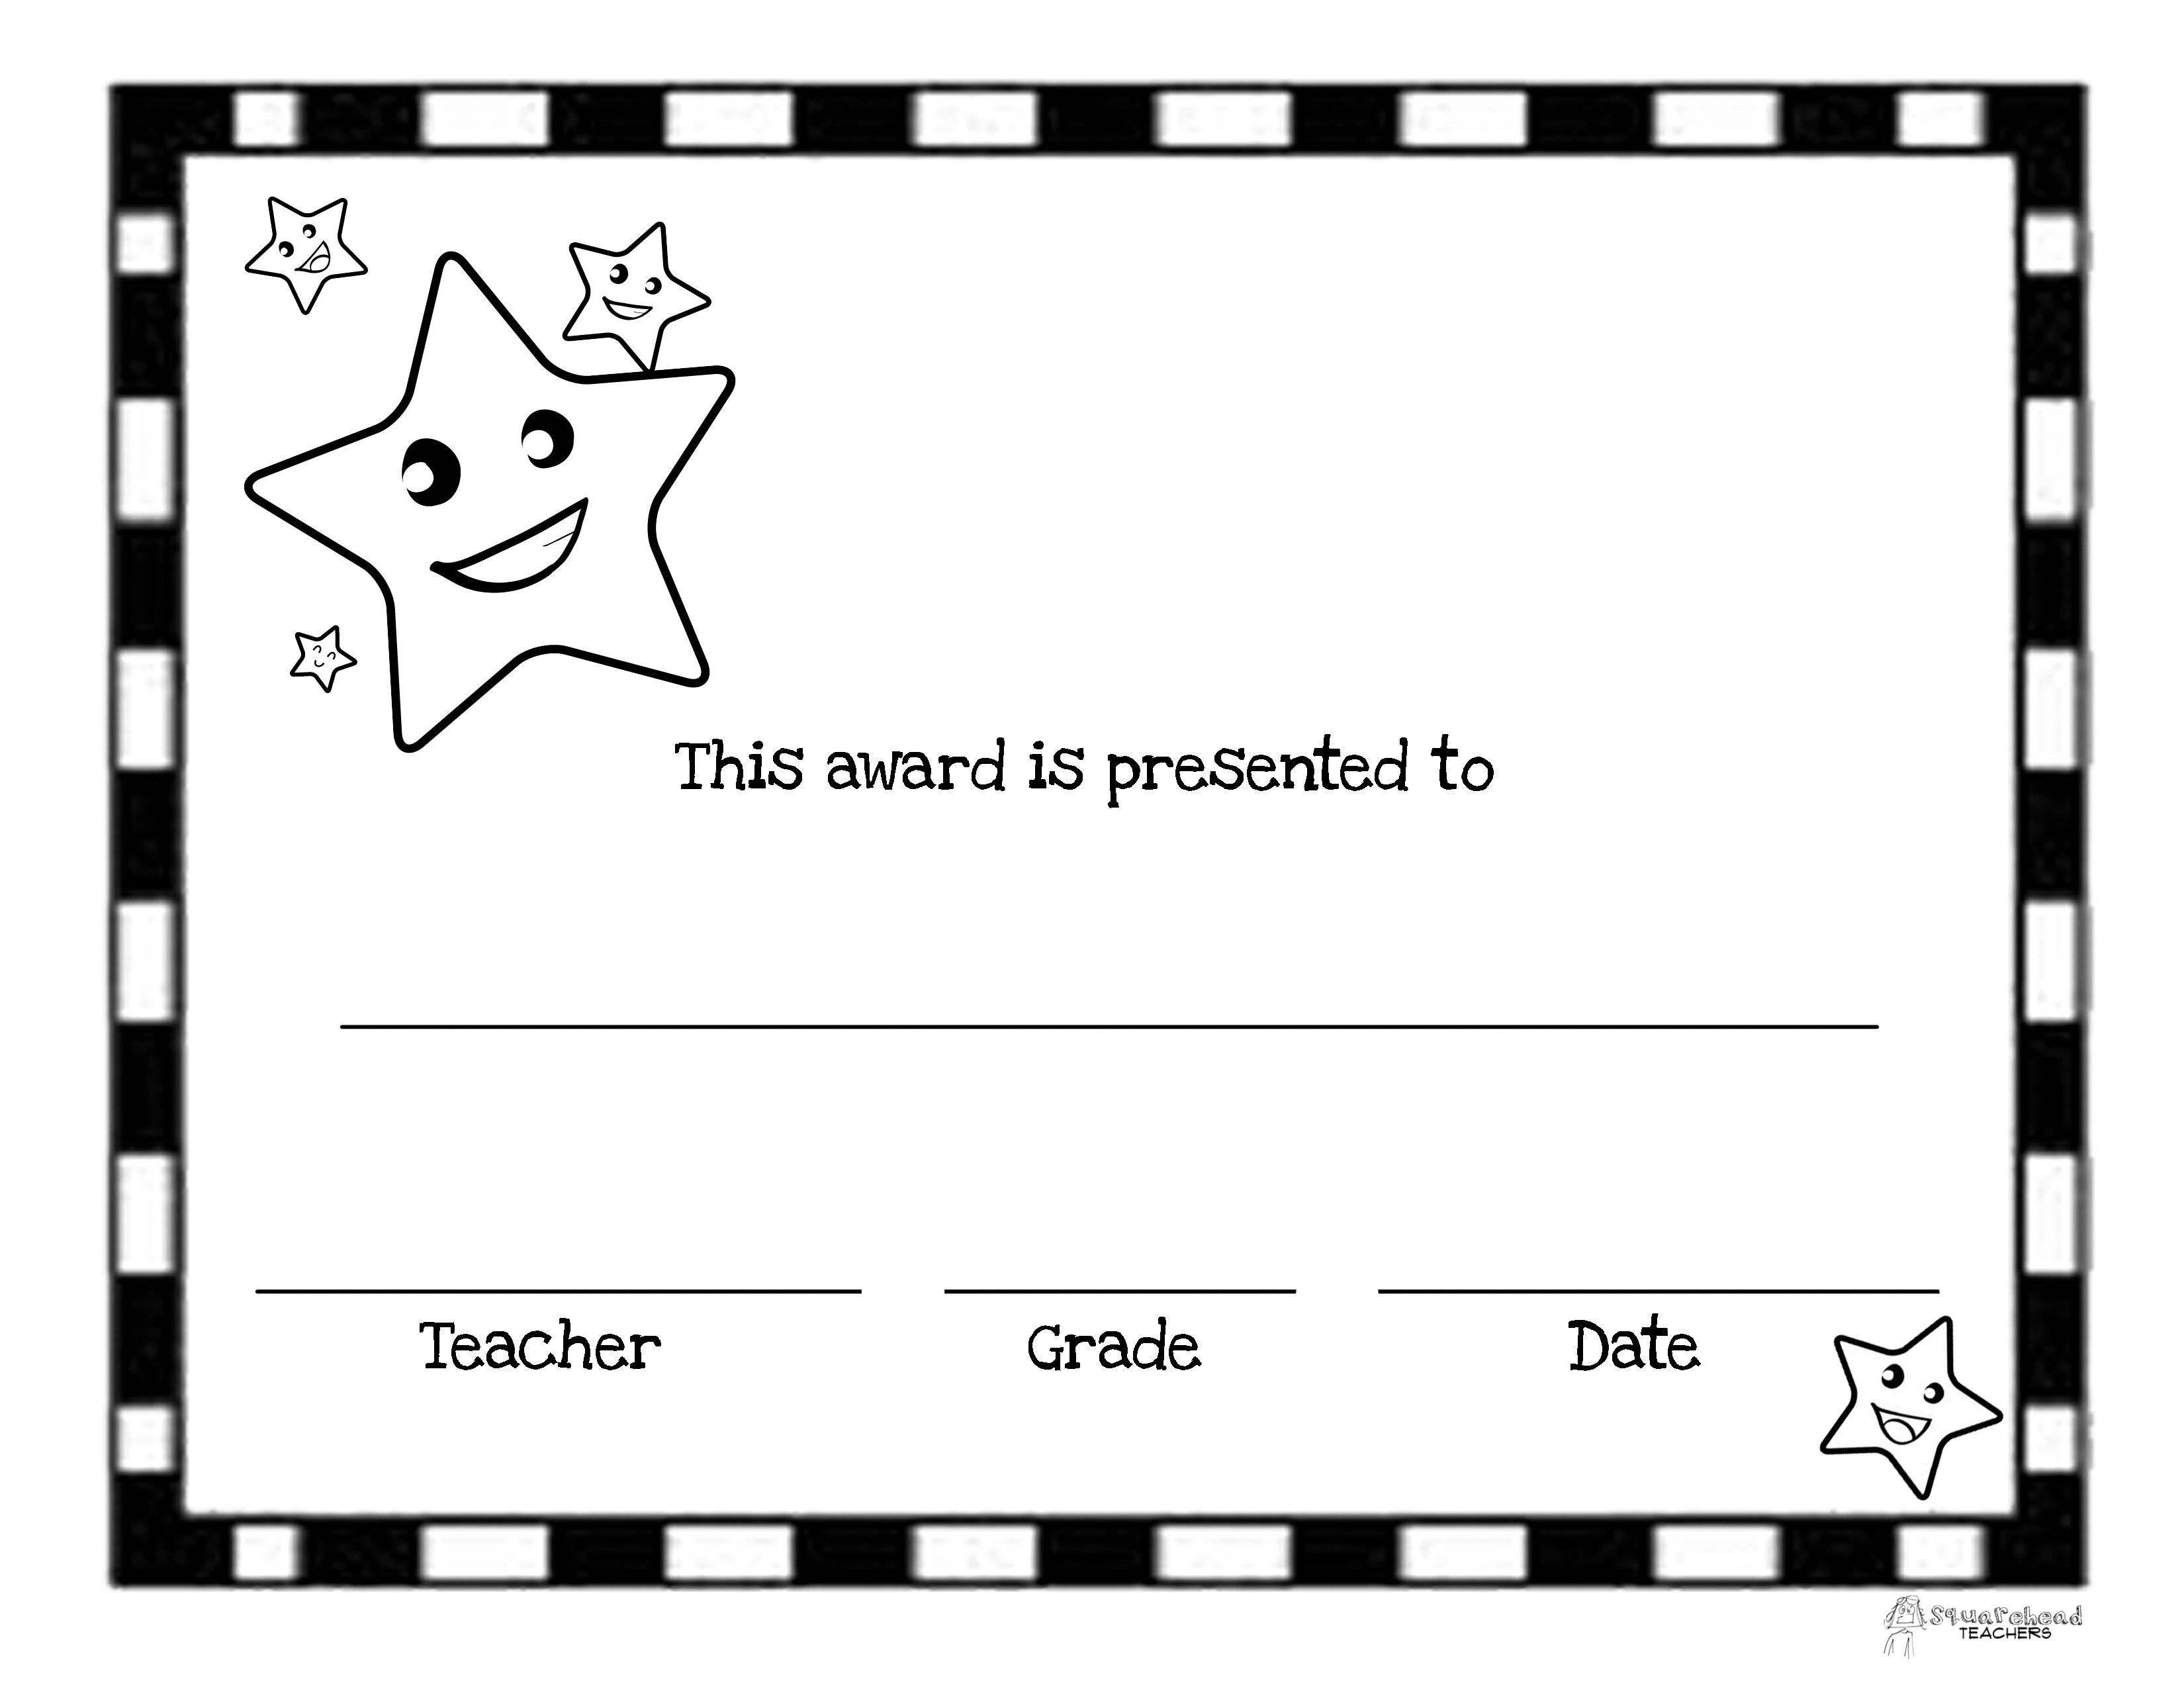 print award certificates  printable end of year awards | Kindergarten Activities | Pinterest ...